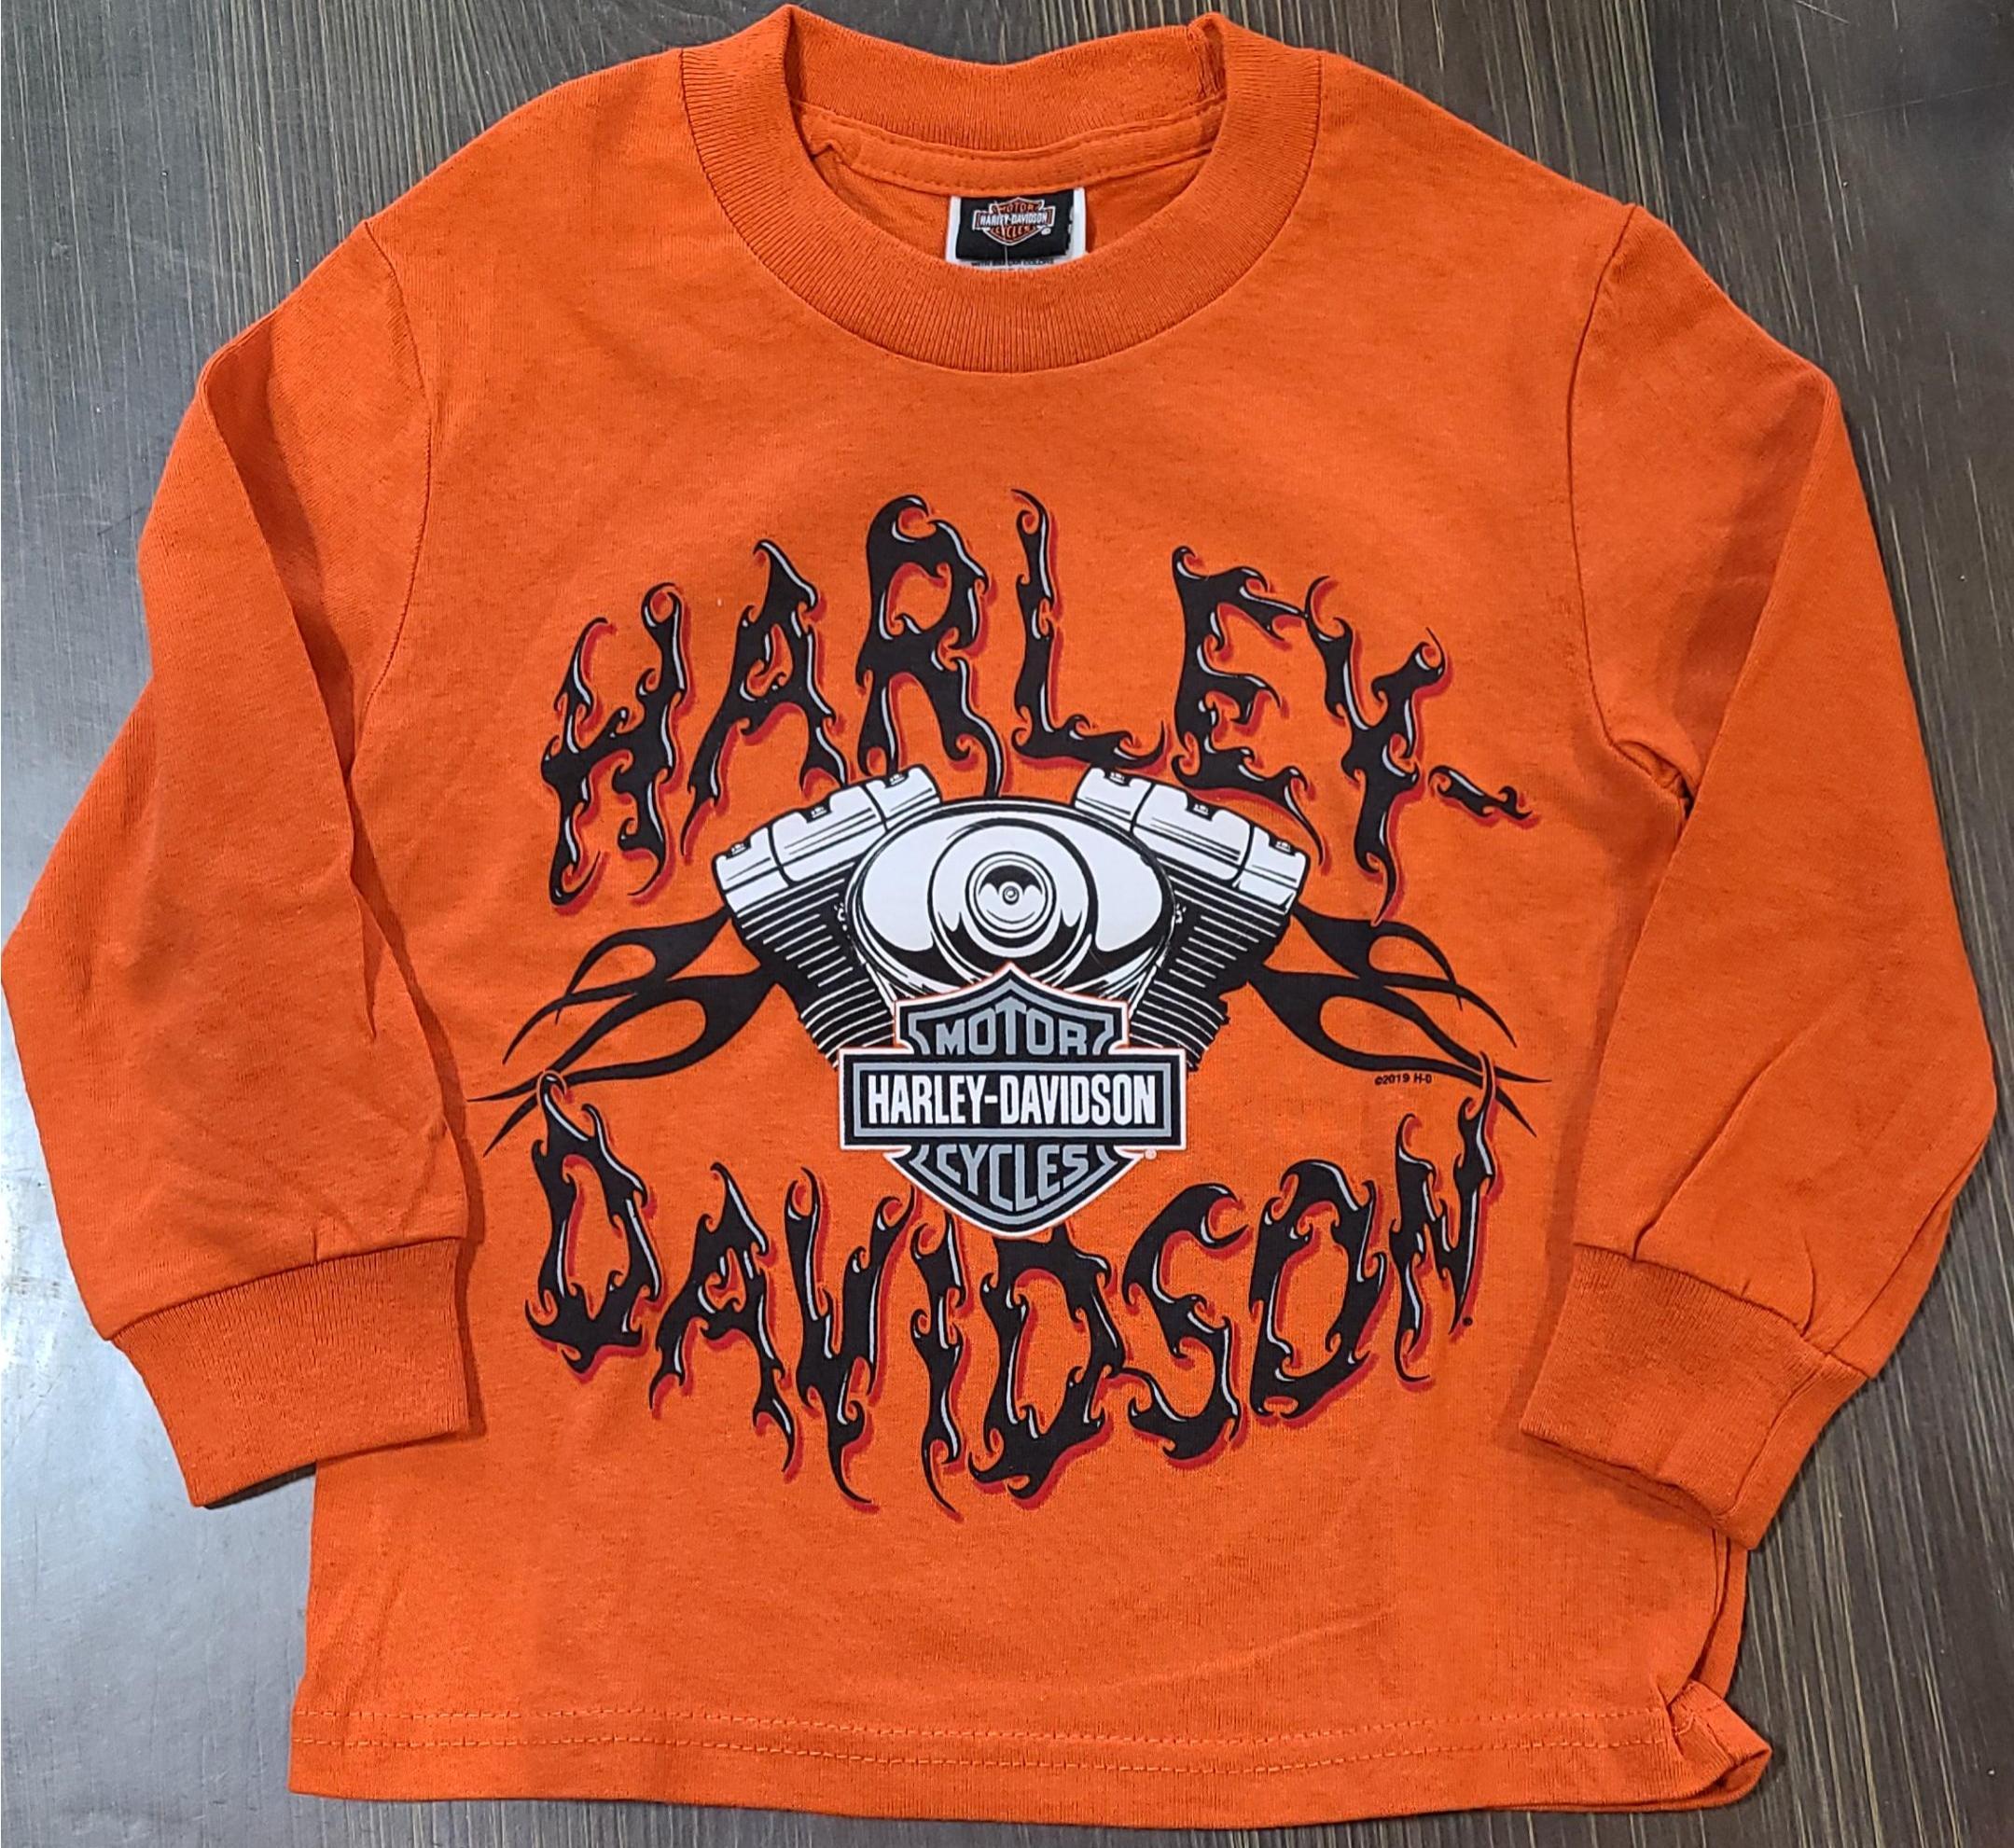 HARLEY DAVIDSON CLASSIC ORANGE*KICKING THE CRHOME SIZE 14YEARS